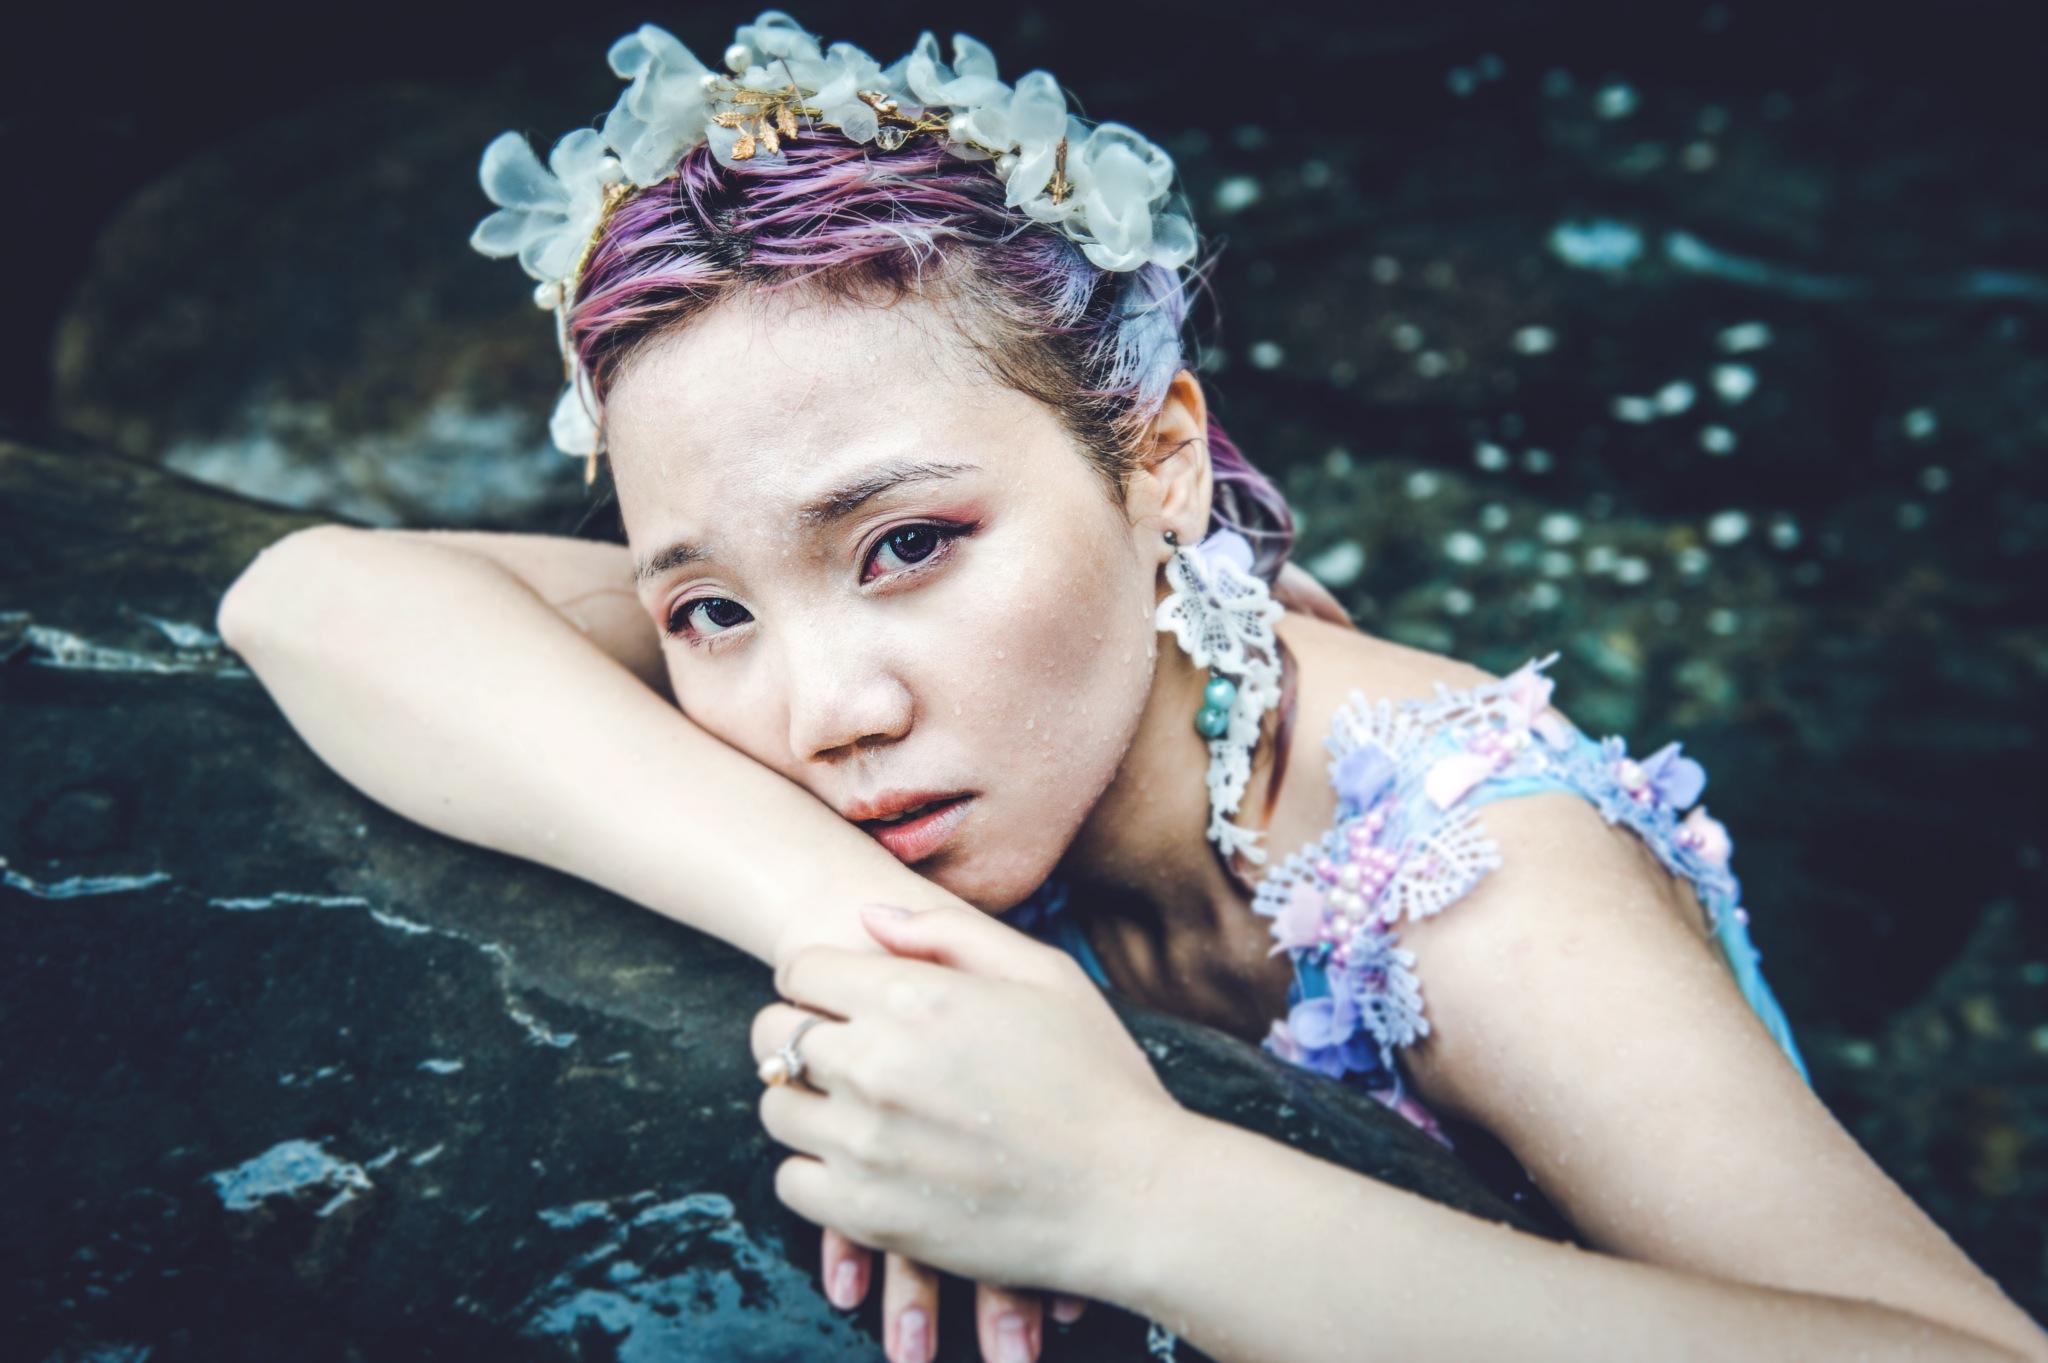 Lady by Toy Wu